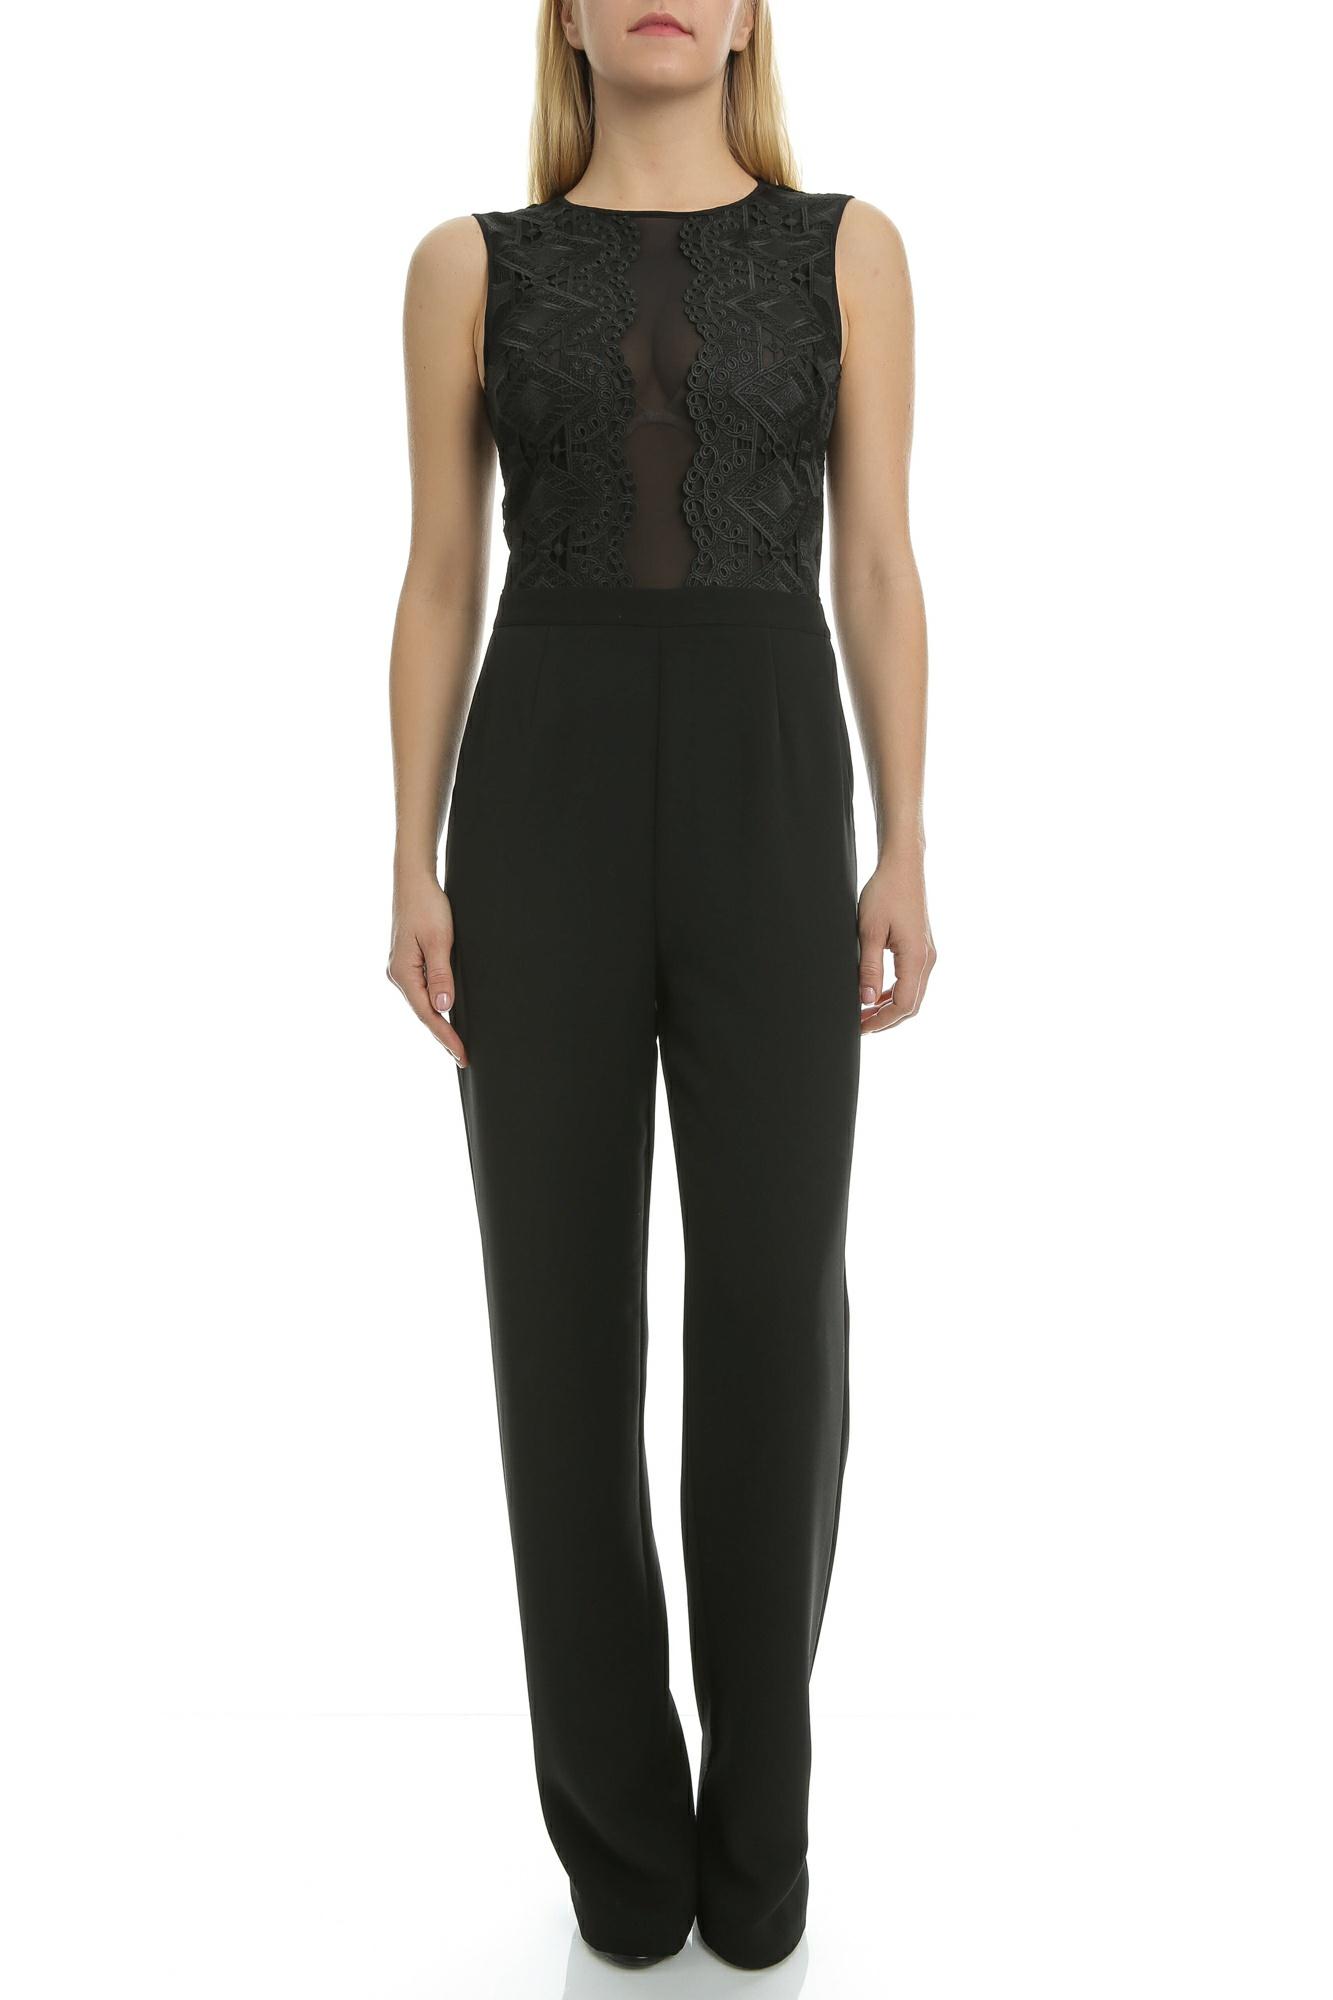 b76dfbbef4f1 JUICY COUTURE - Γυναικεία ολόσωμη φόρμα Juicy Couture μαύρη